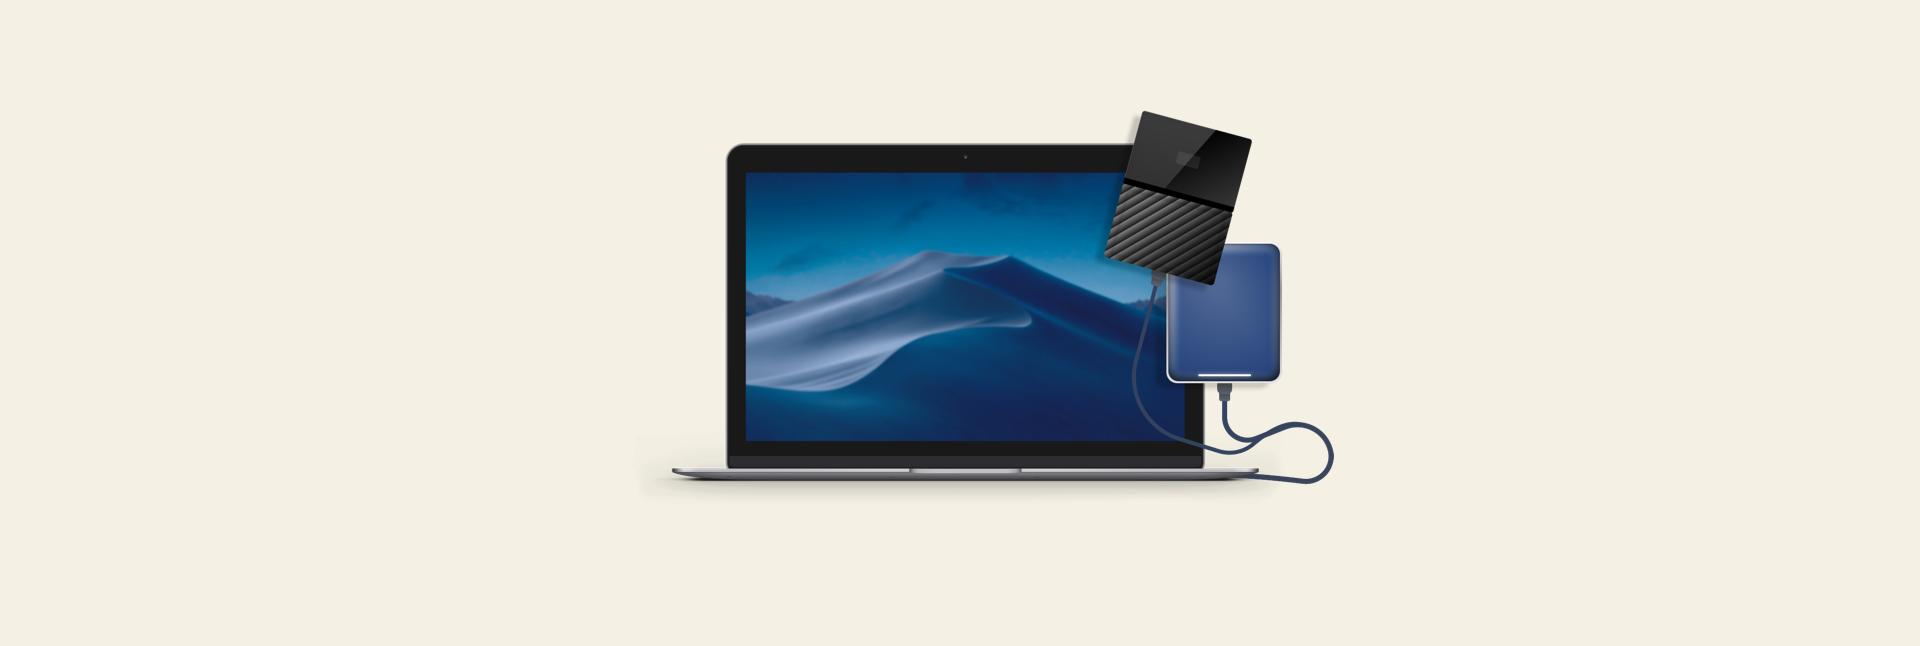 External hard drive for macbook